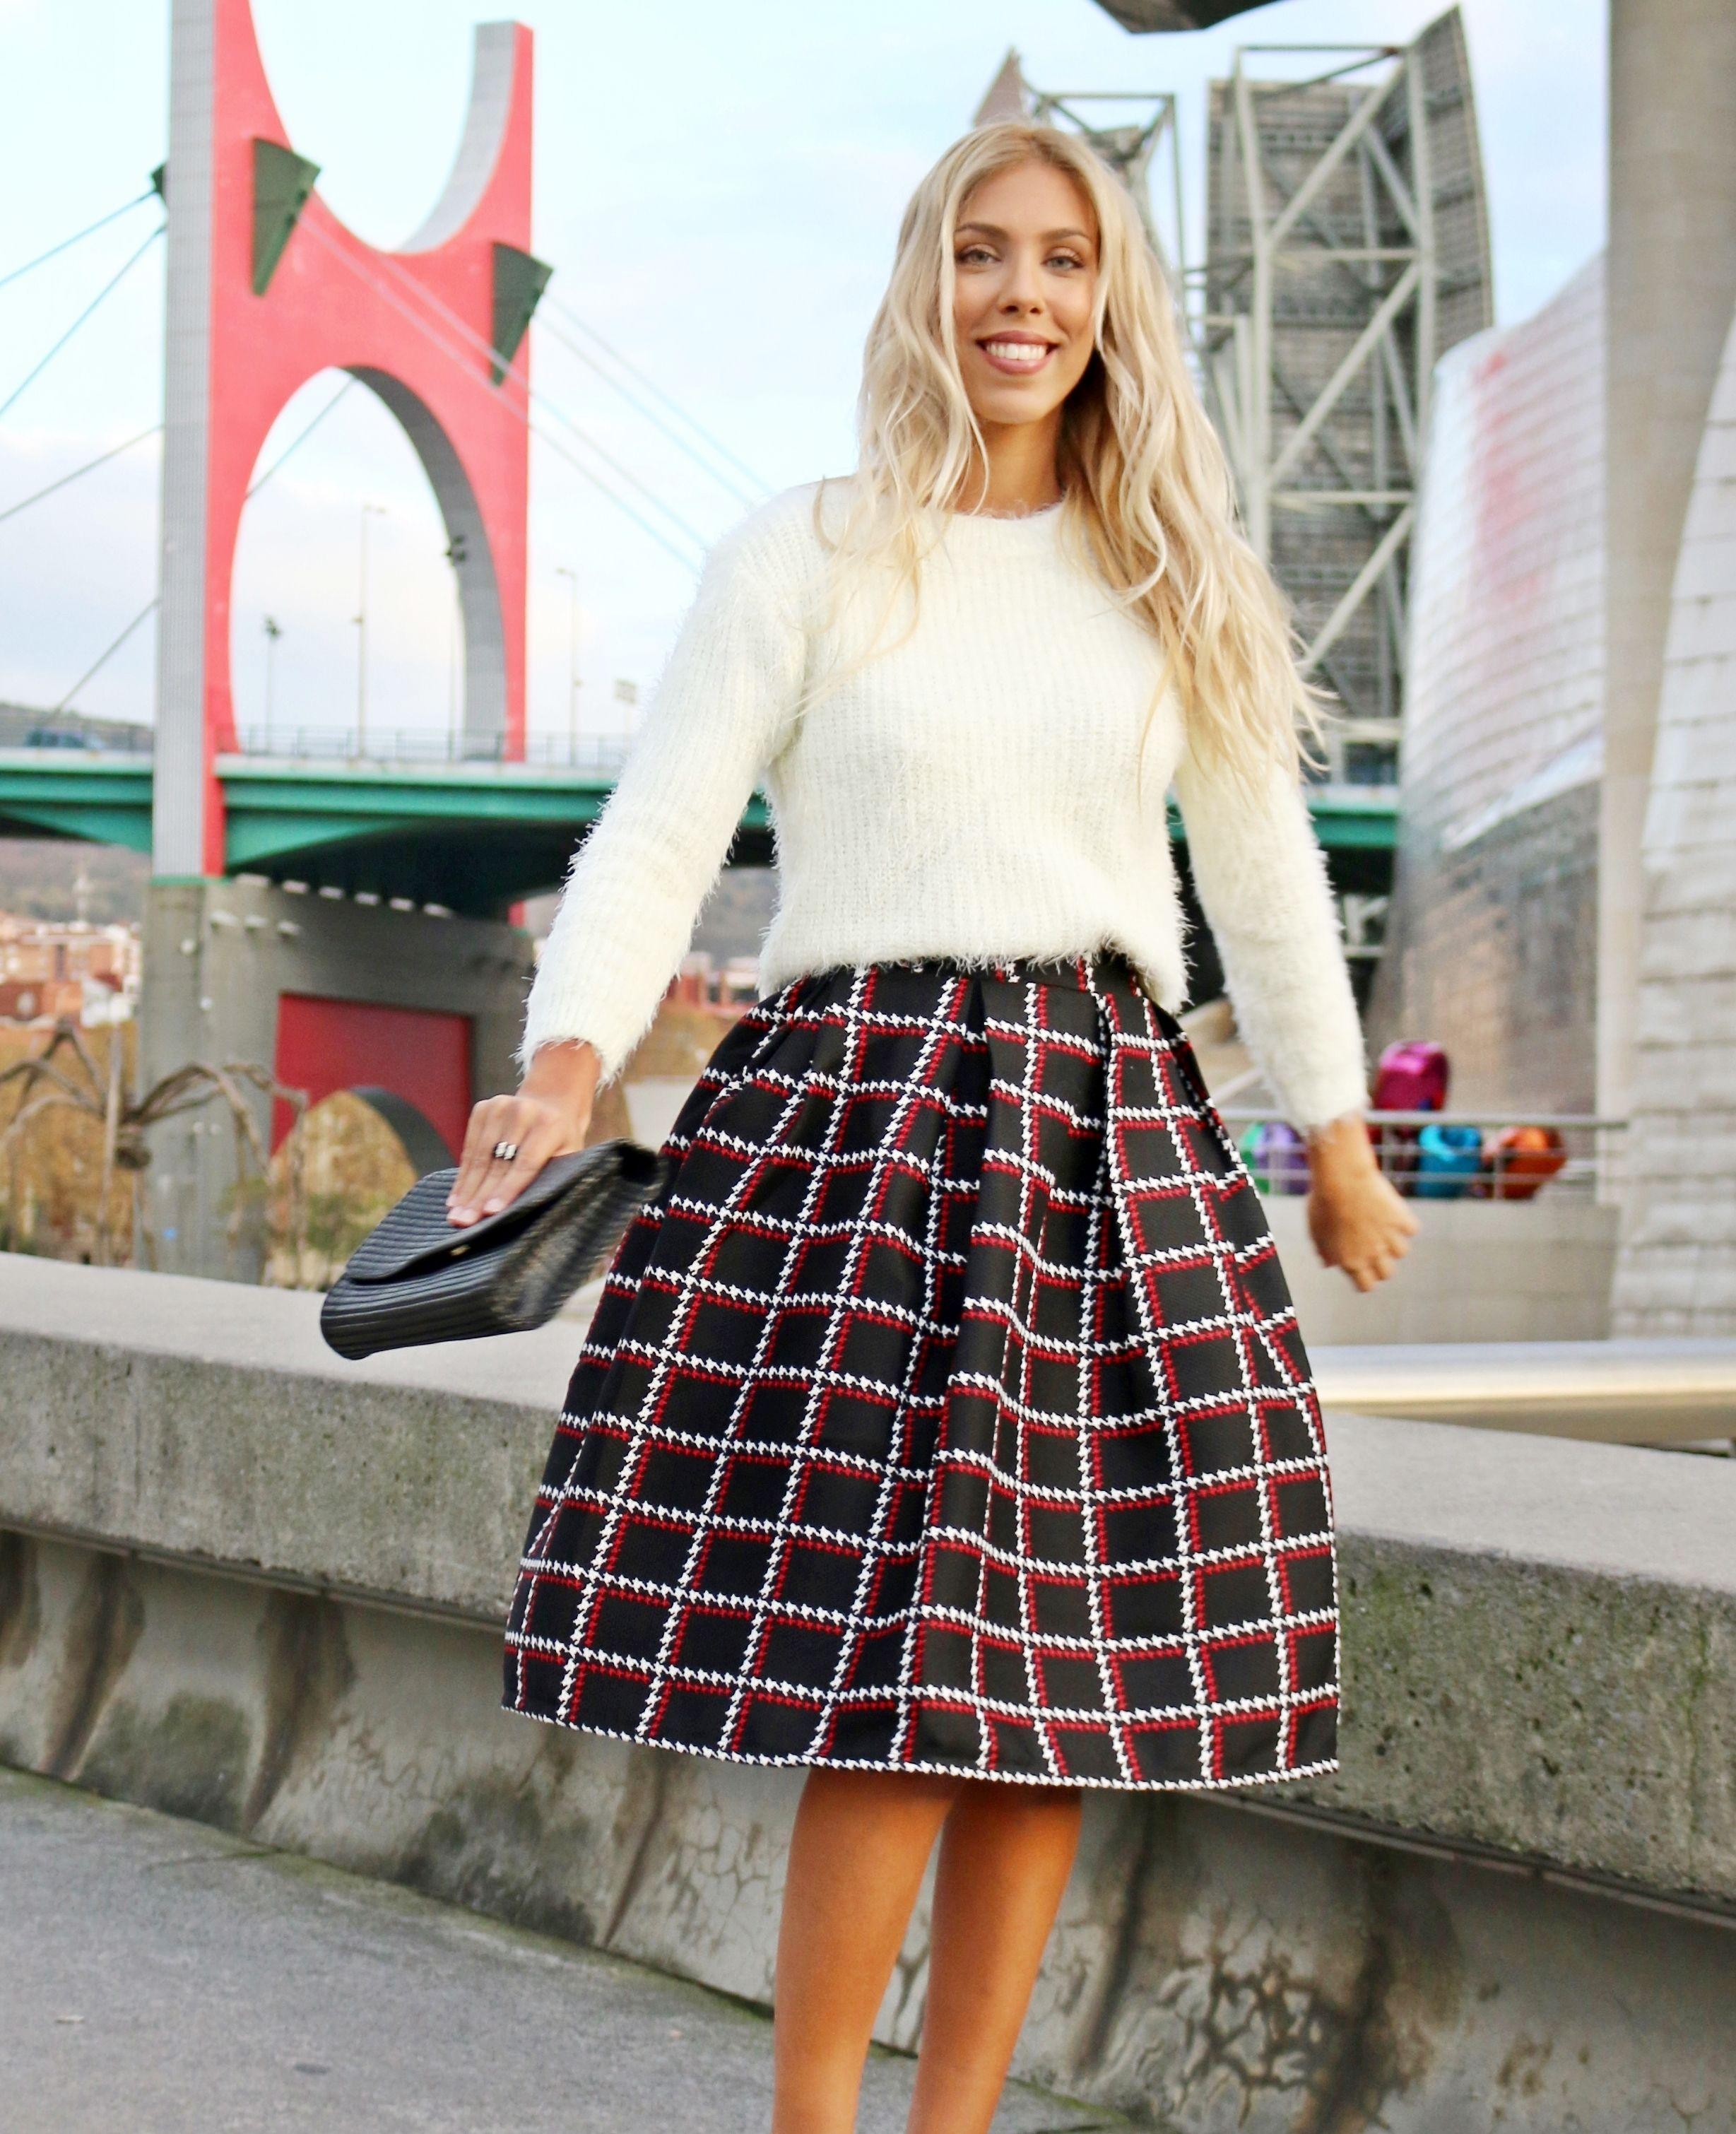 La falda perfecta   Perfect skirt  Sheinside  kissmylook 60acc7569501